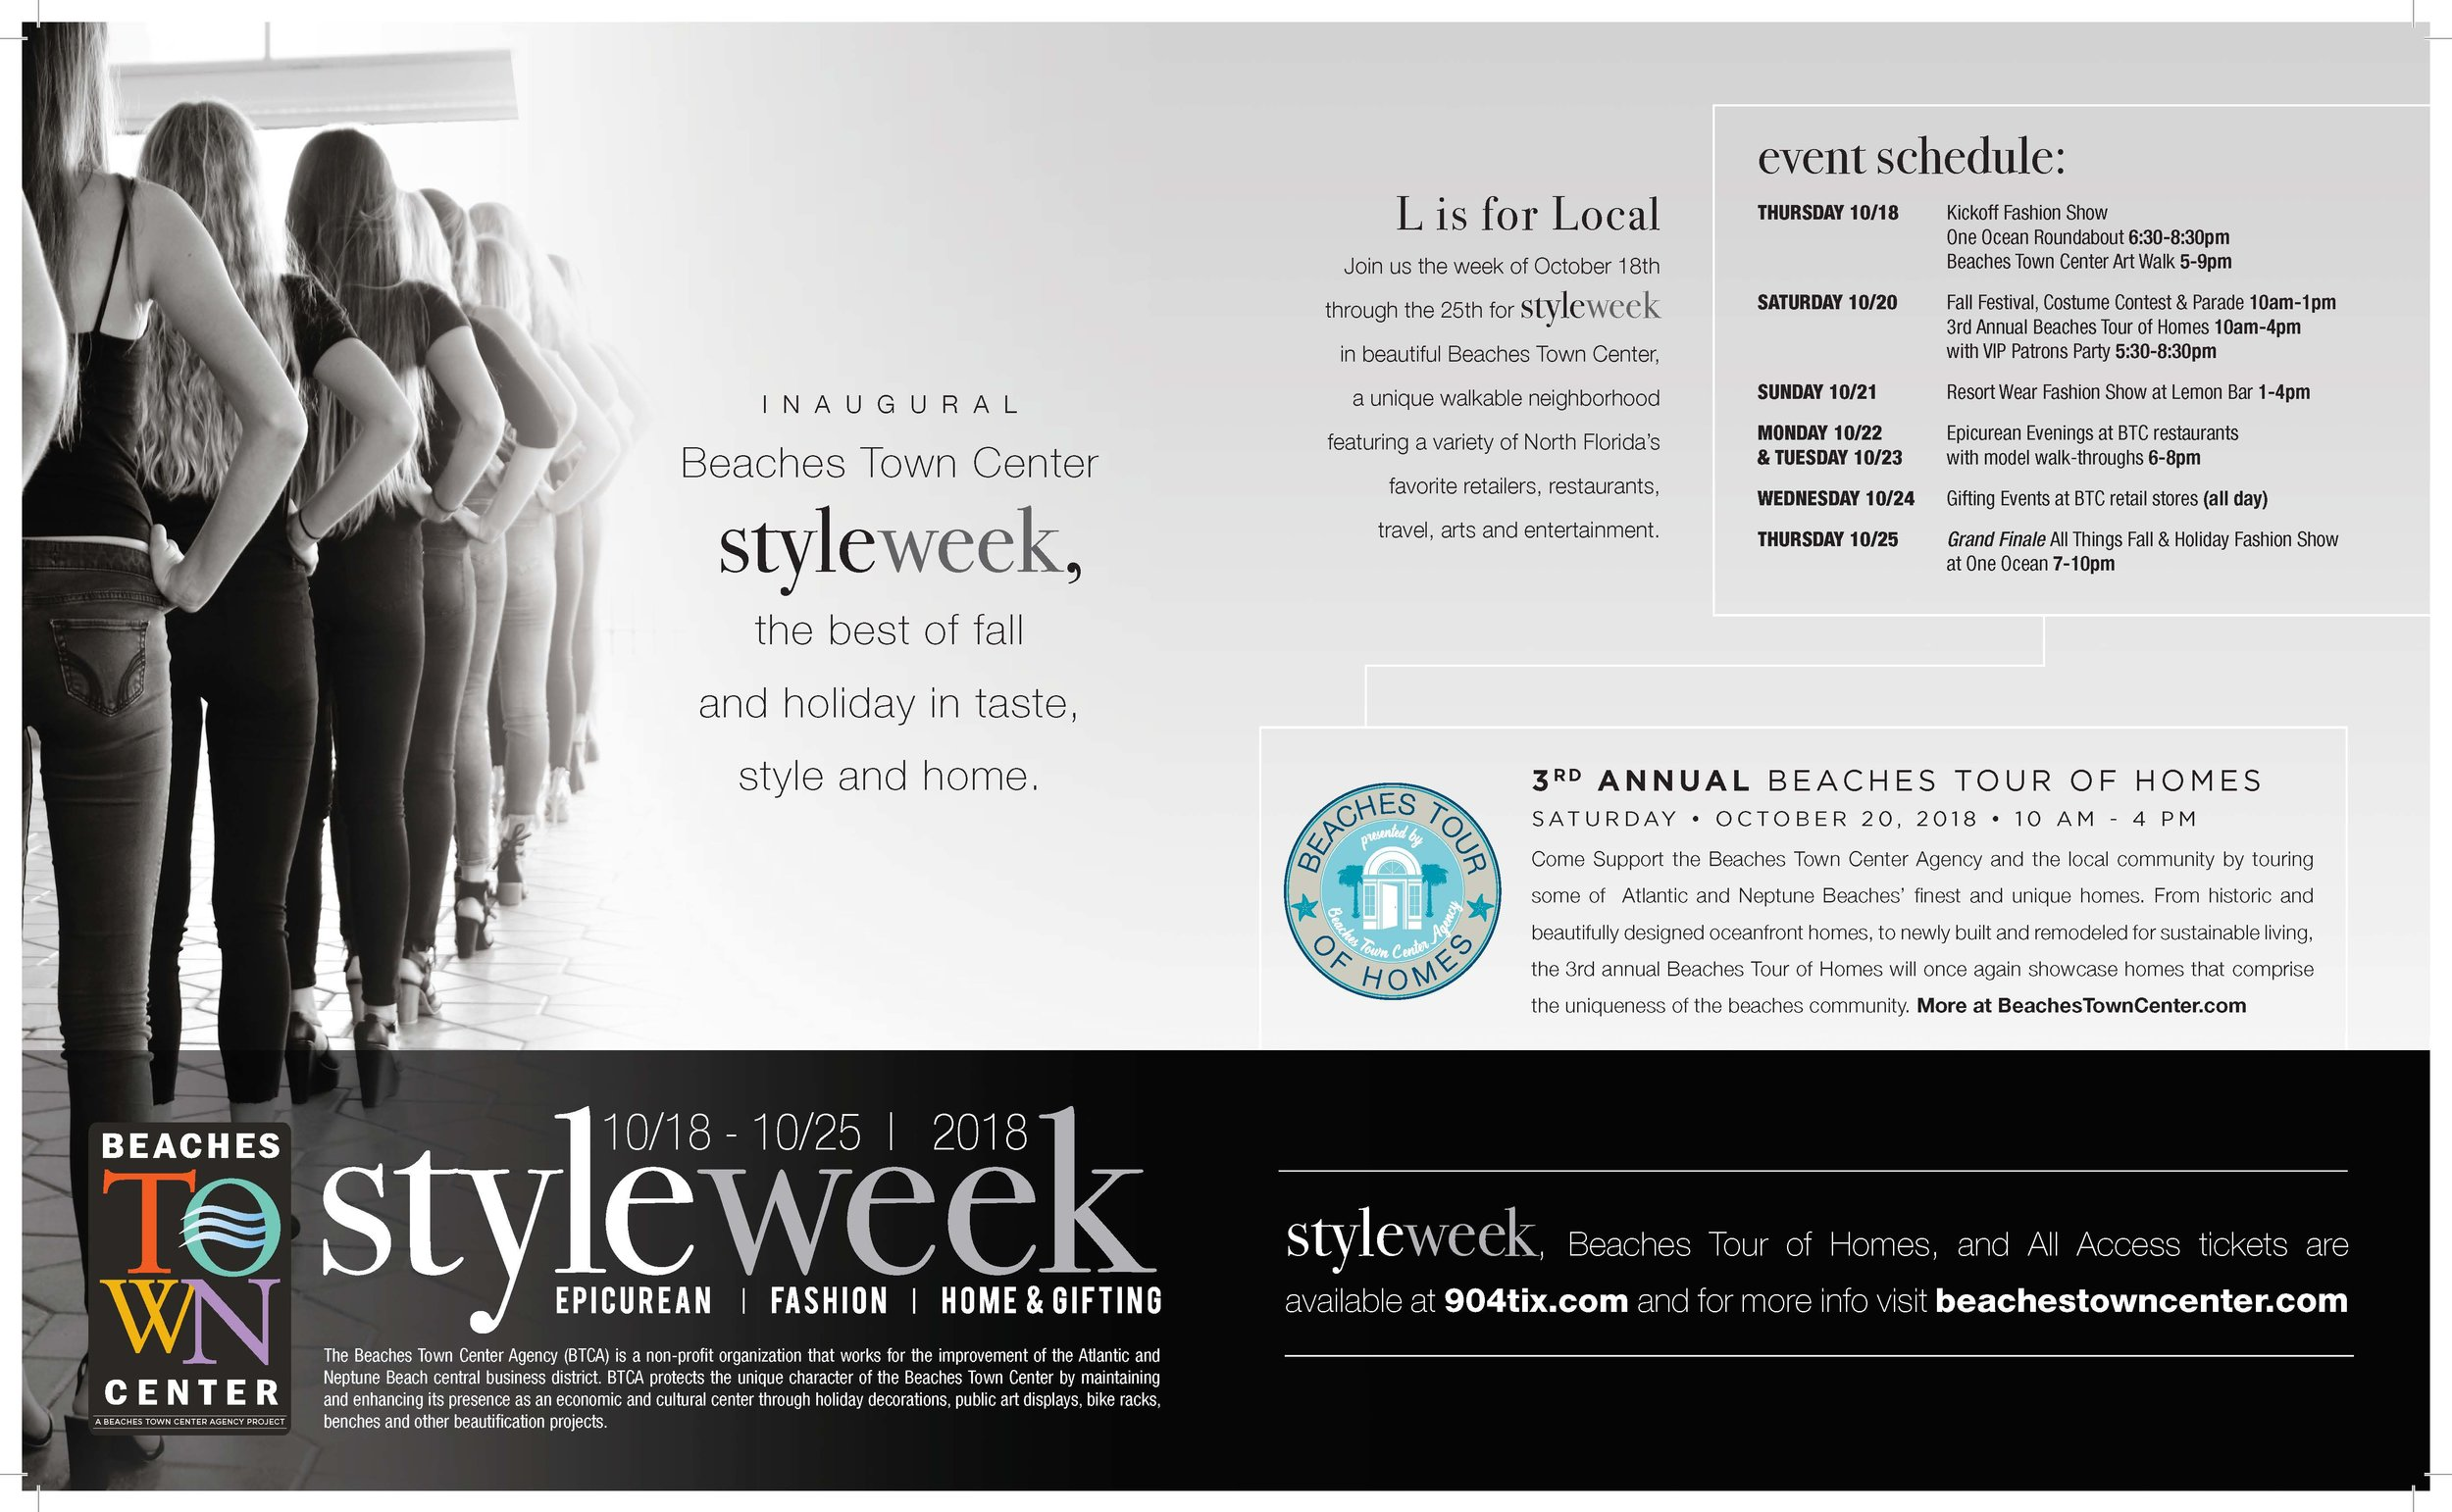 StyleWeekAd-JaxMag.jpg